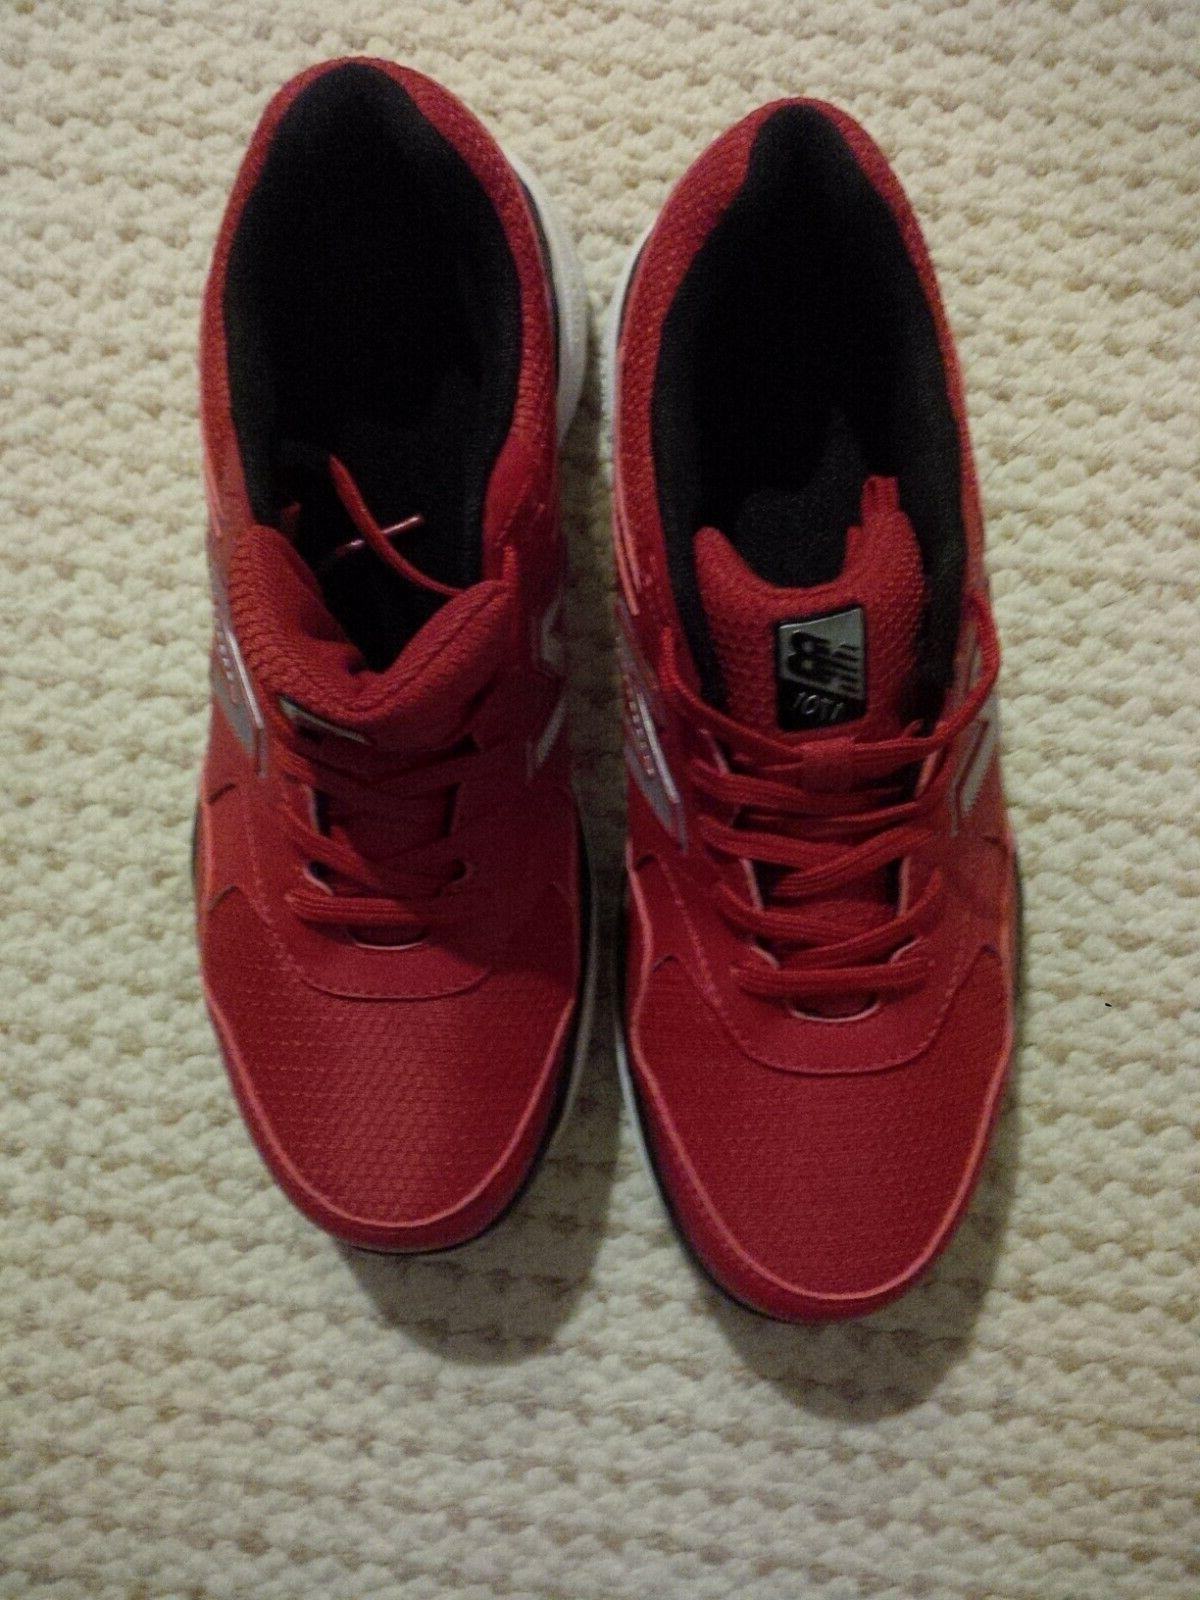 New Men's 1701 Golf Shoe Size